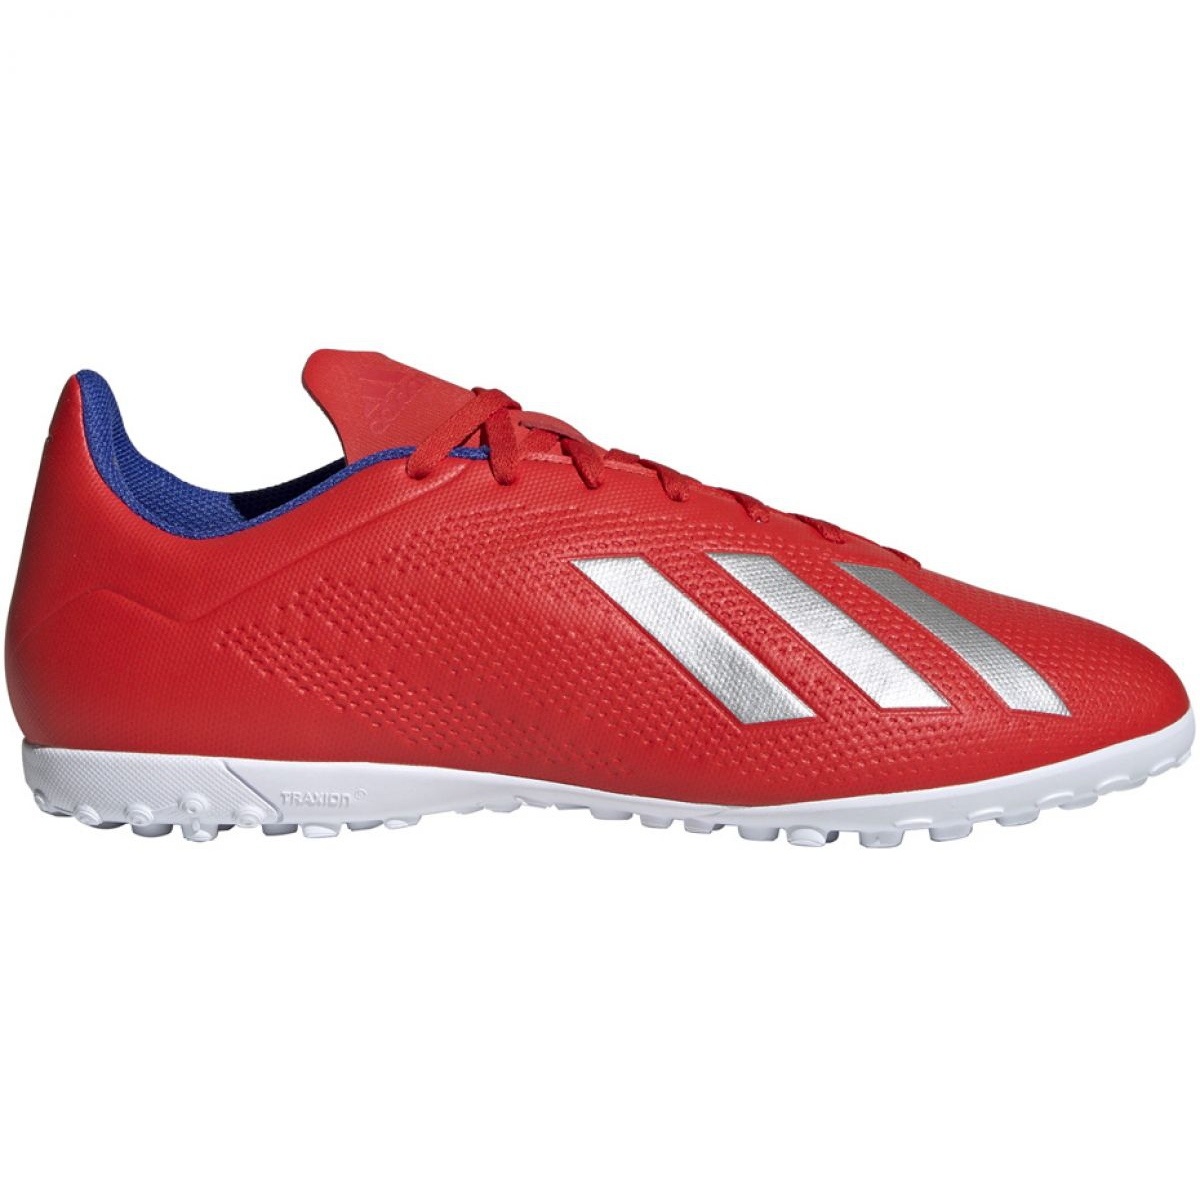 Menor preço em Chuteira Adidas Infantil Nemeziz Messi Tango 17.4 Tf